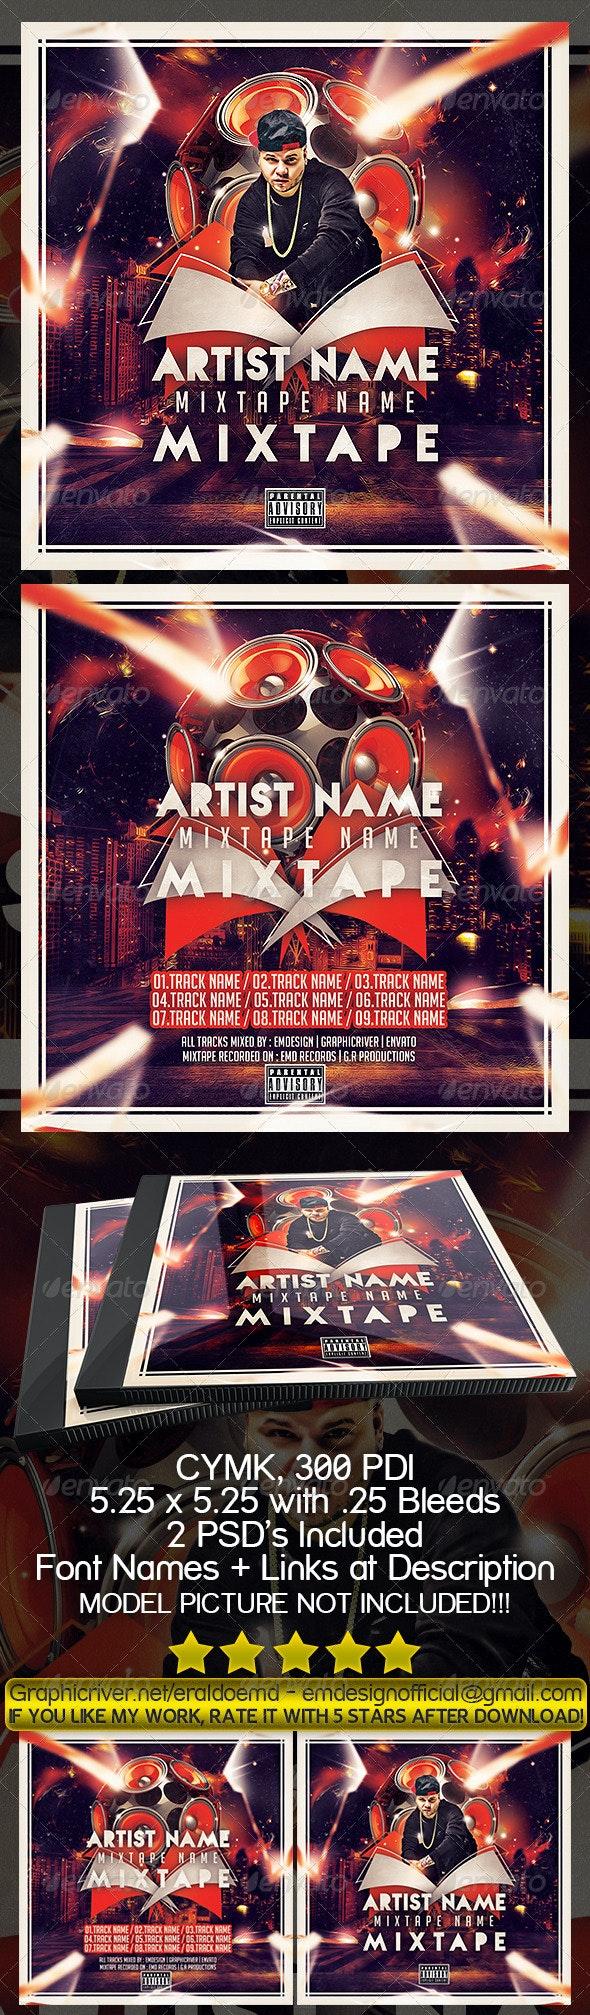 CD Mixtape Cover - CD & DVD Artwork Print Templates